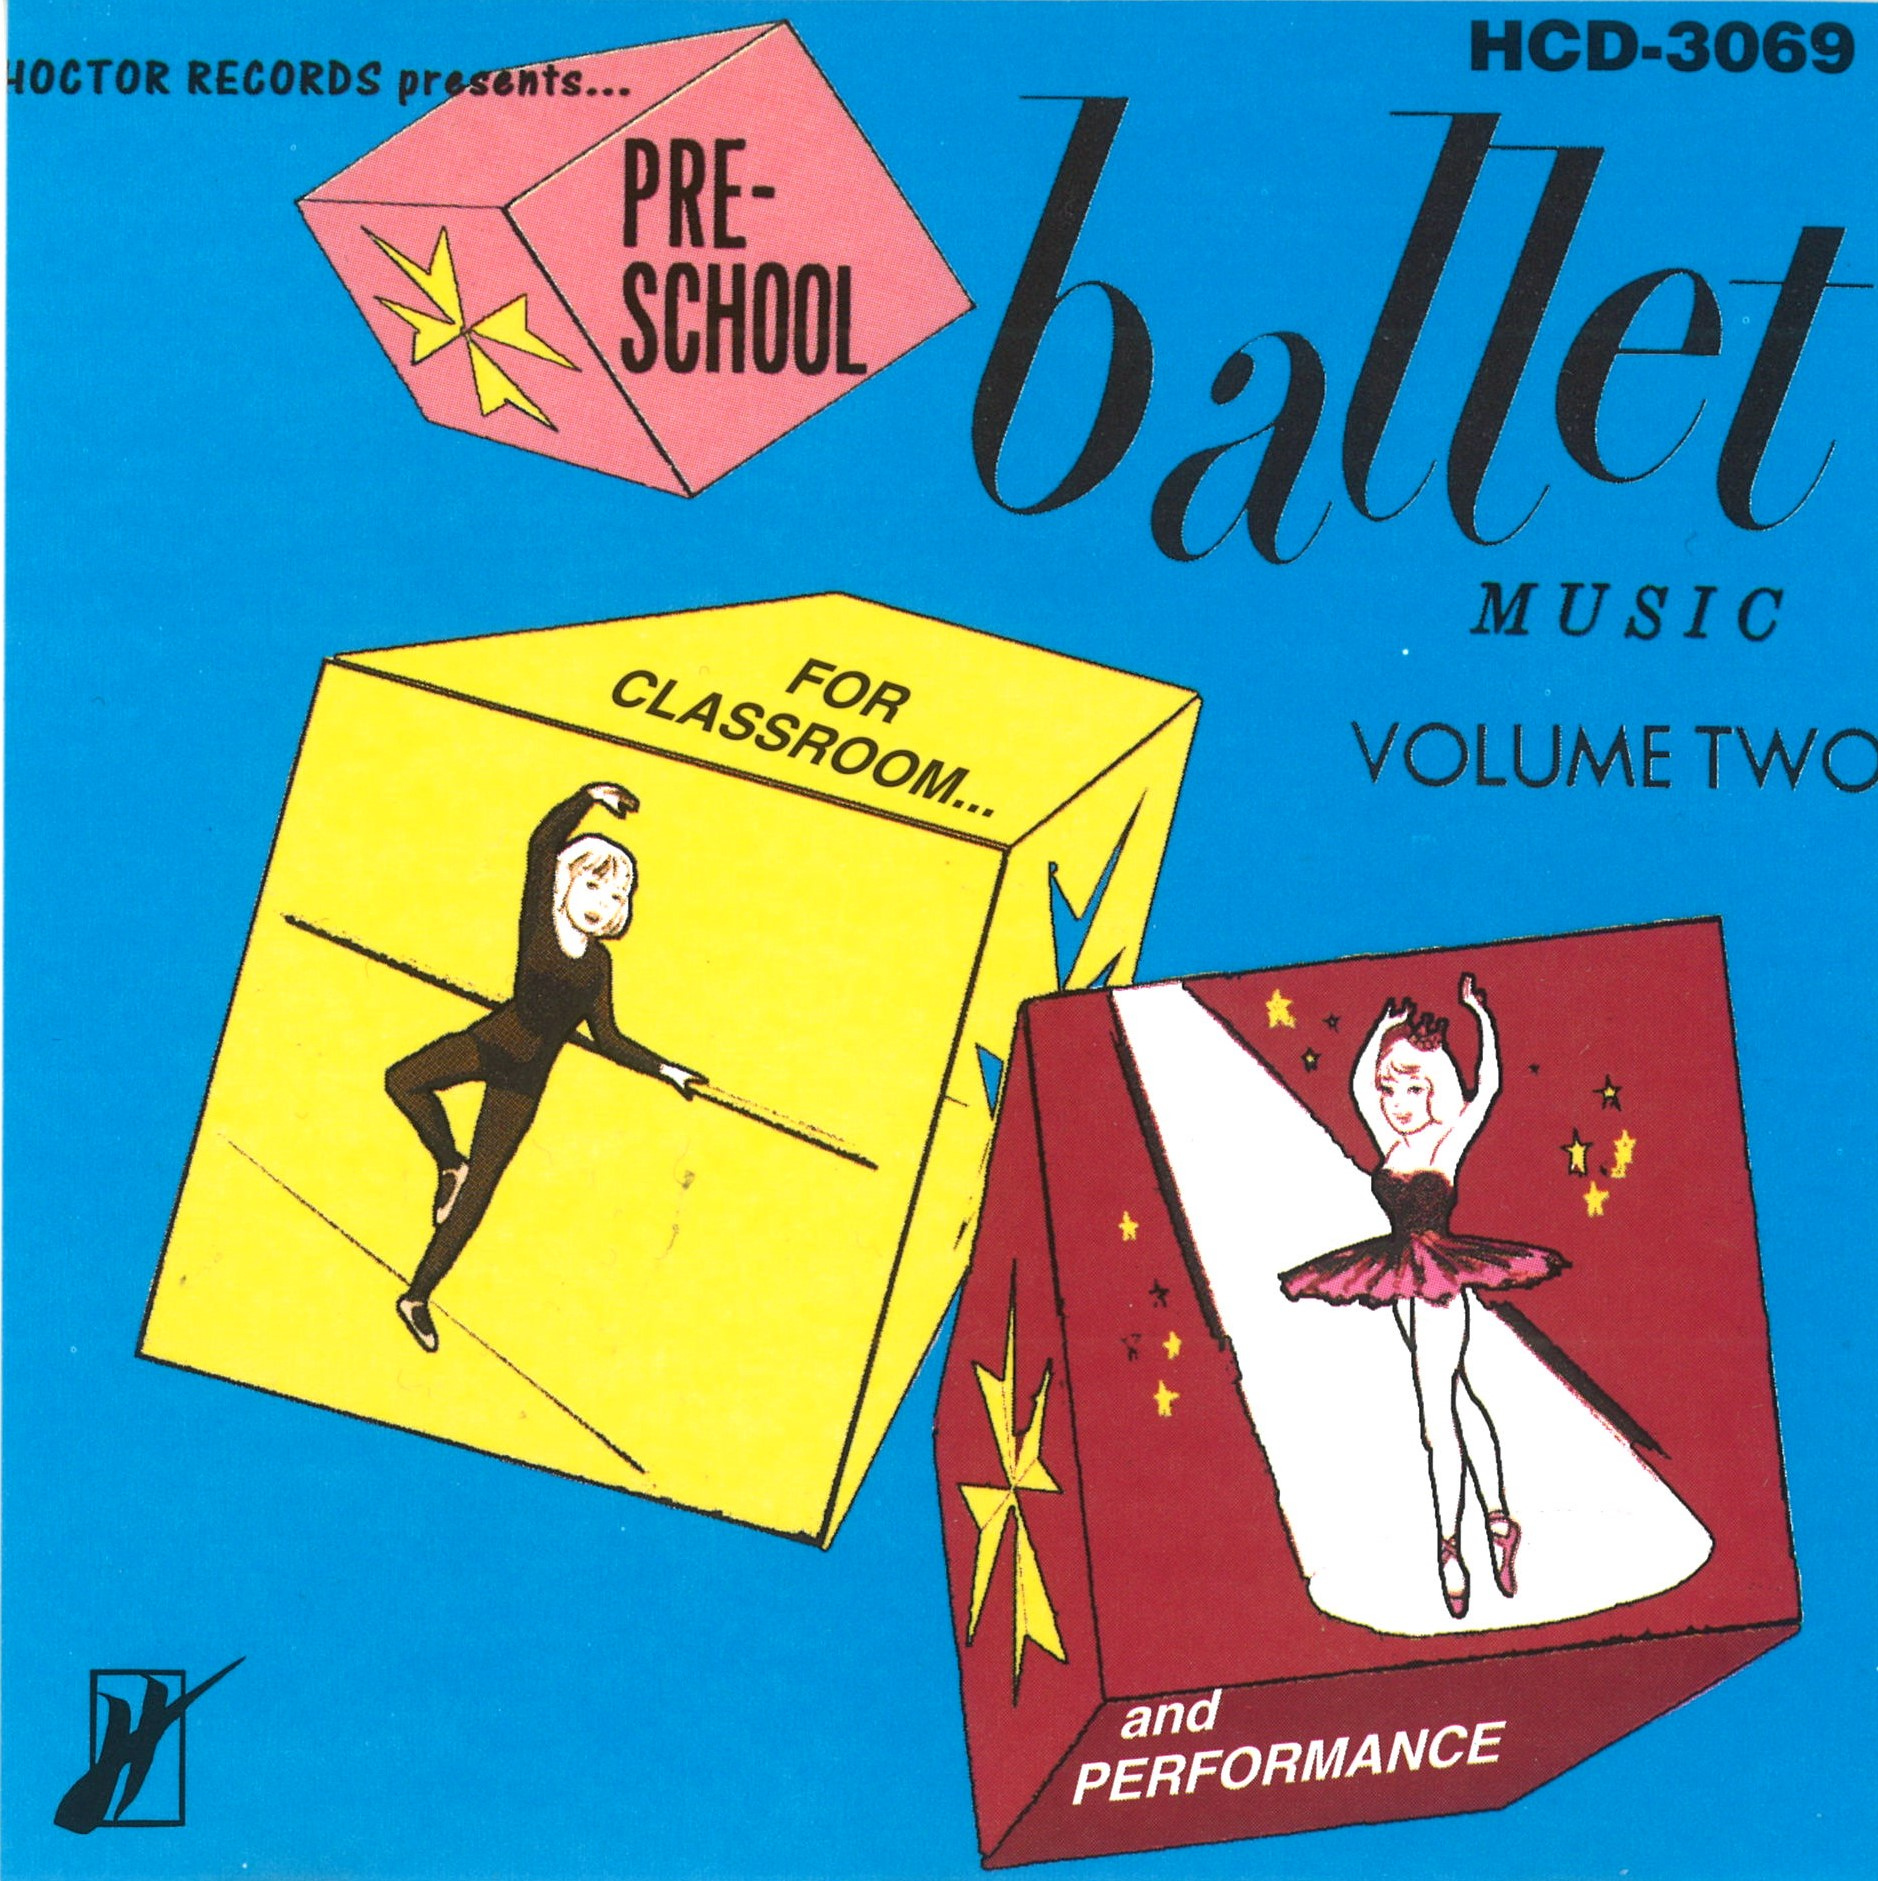 CD Pre-School Ballet Music Vol.2 (HCD-3069)